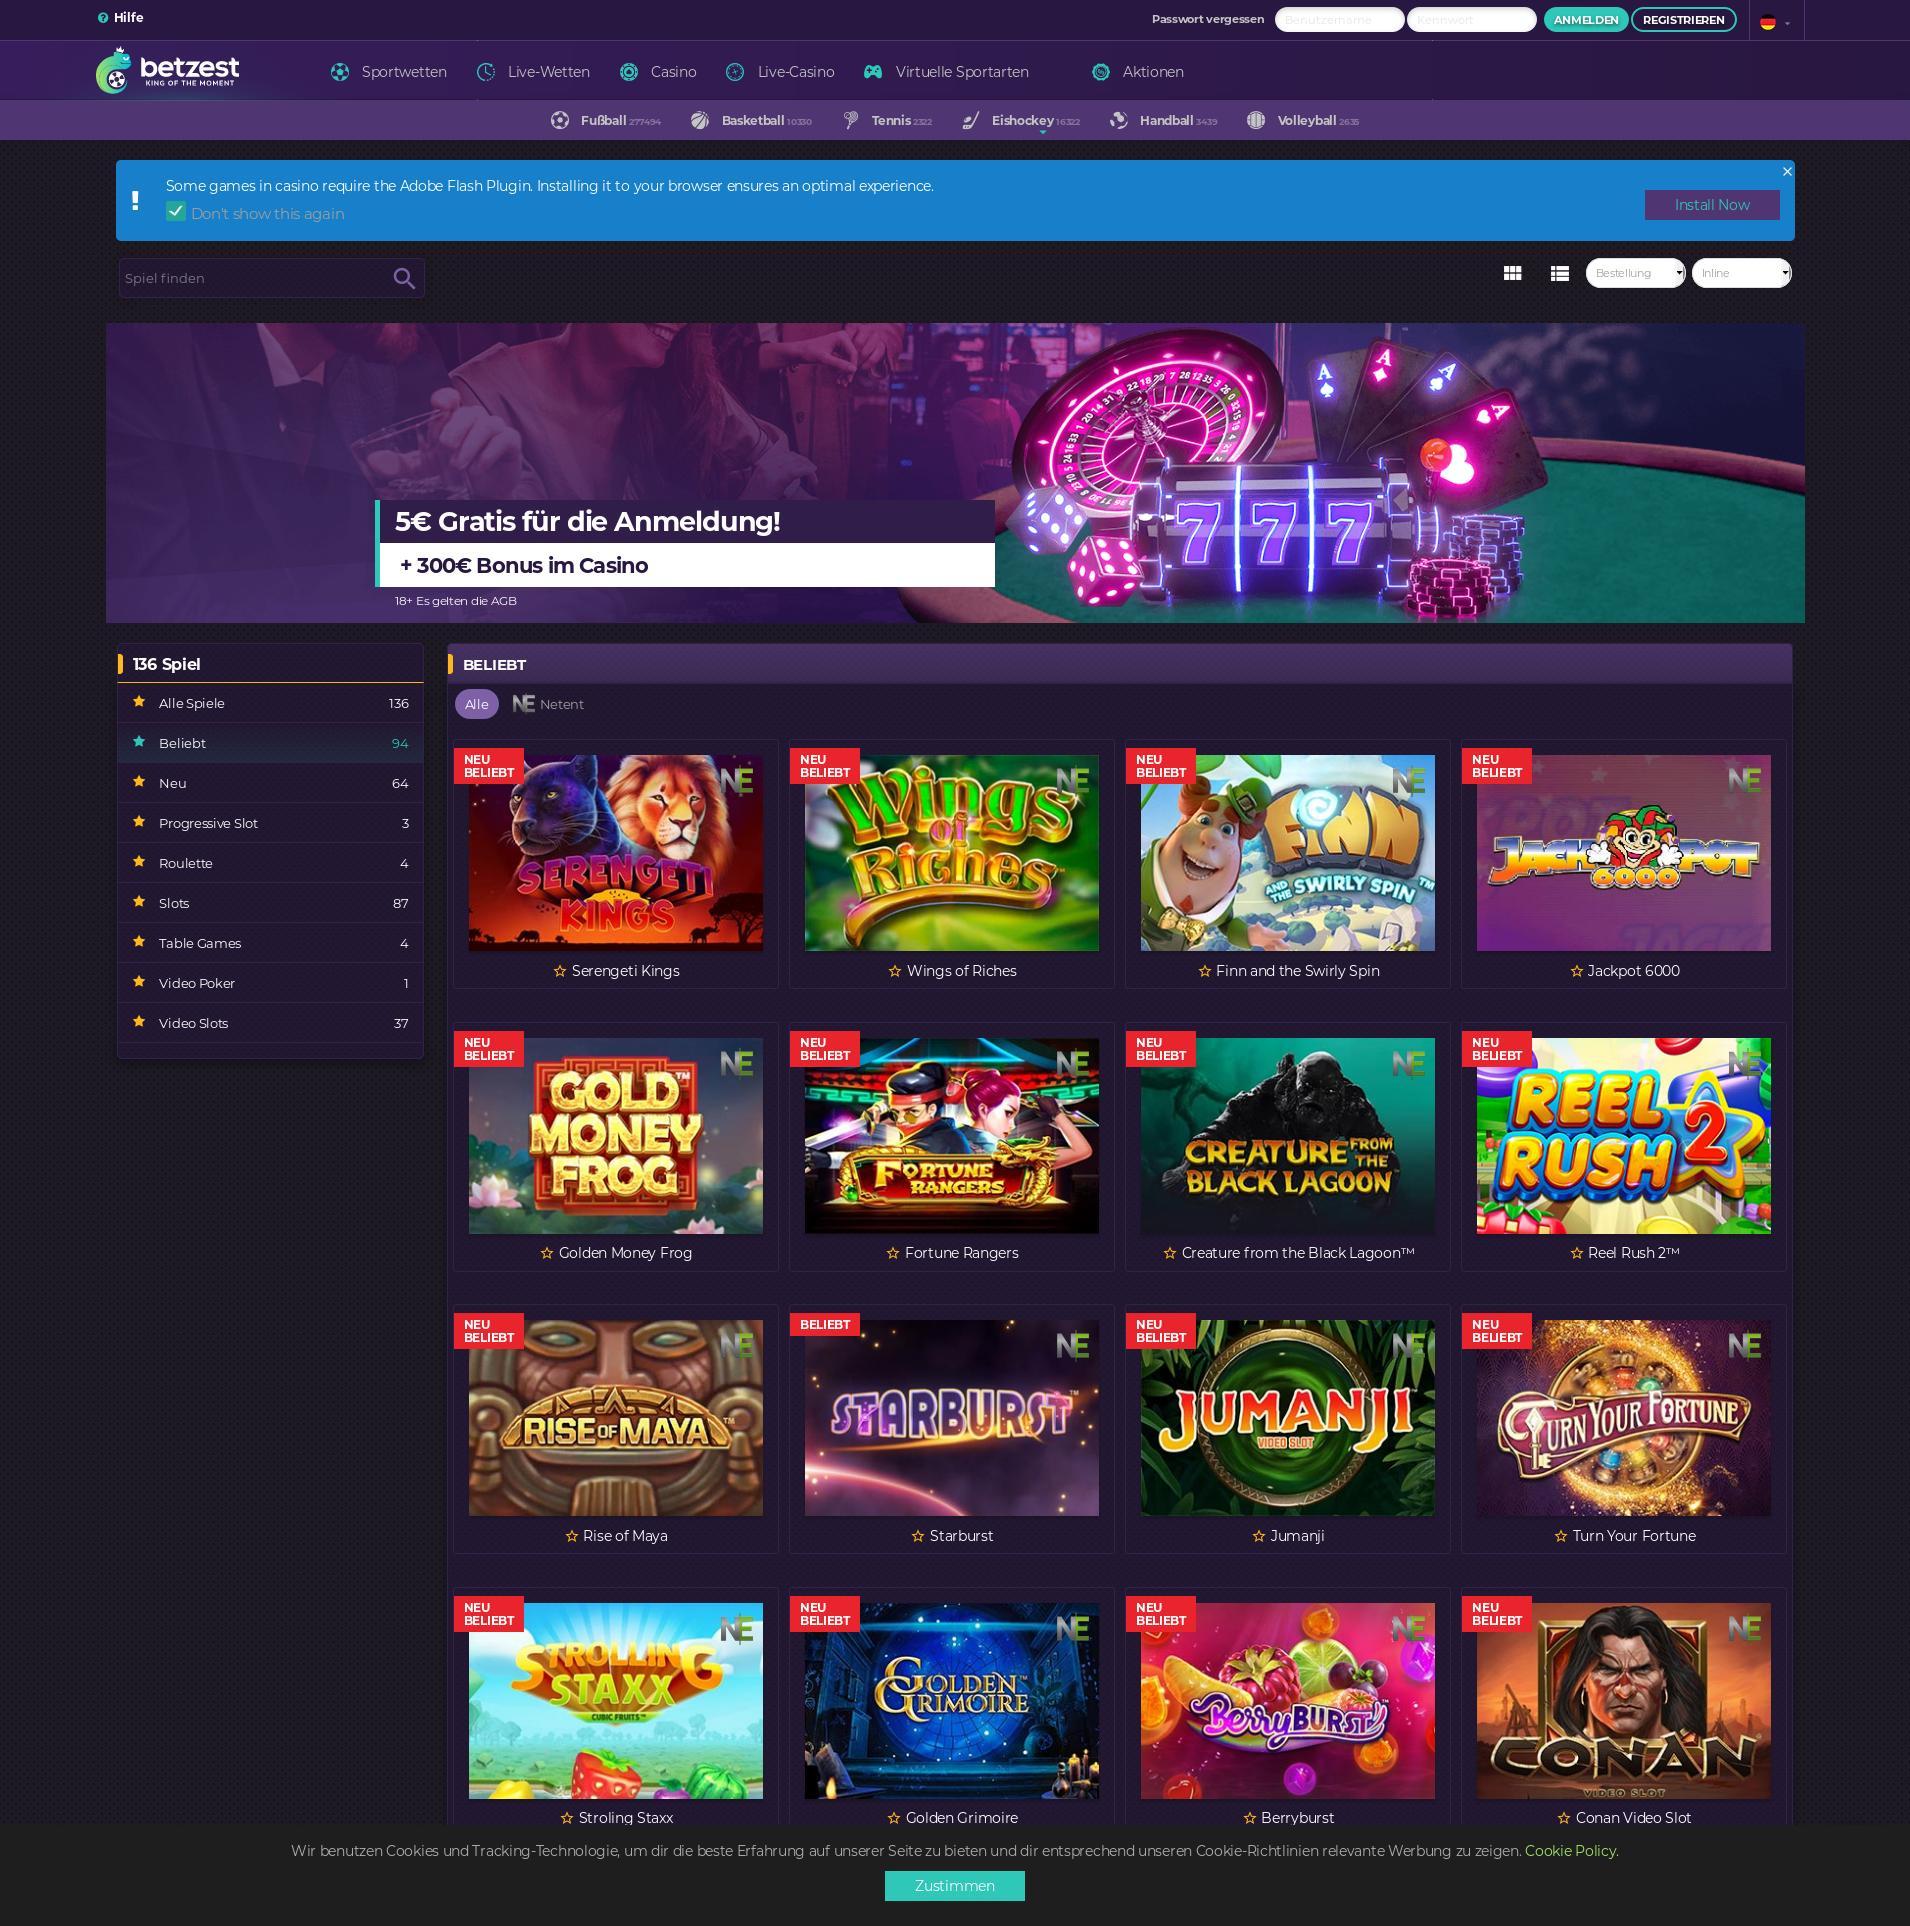 Casino screen Lobby 2020-02-15 for Germany